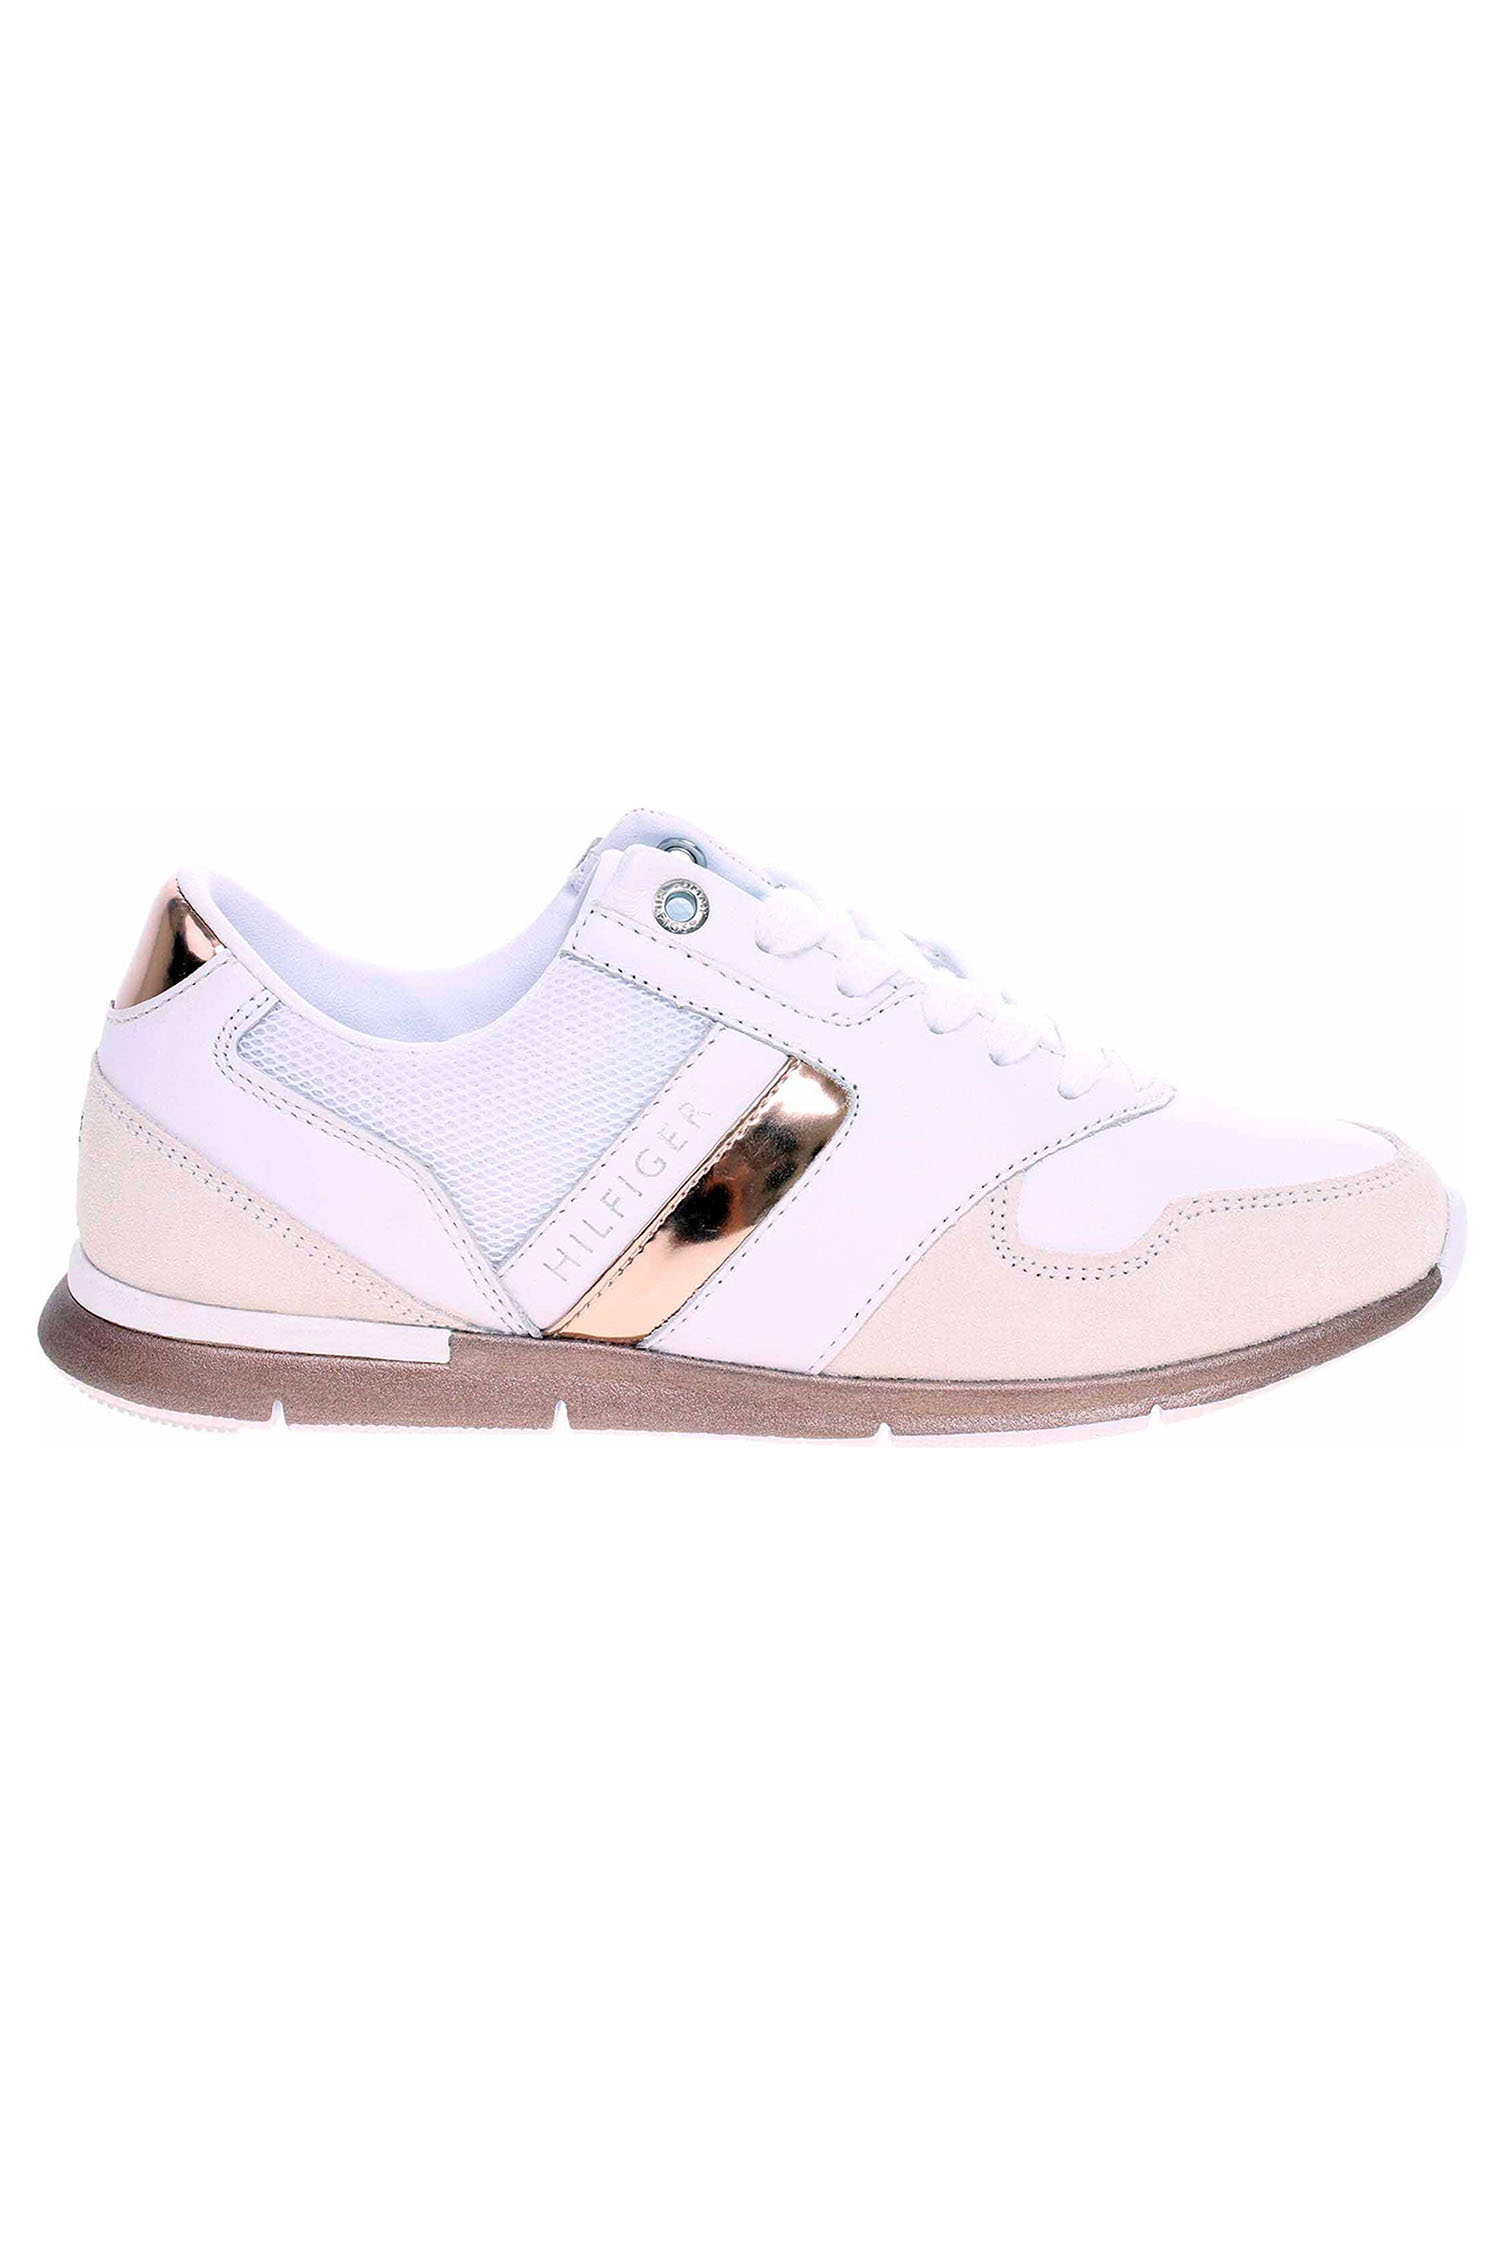 Tommy Hilfiger dámská obuv FW0FW04100 white-rose gold FW0FW04100 901 ... 5426f223e6